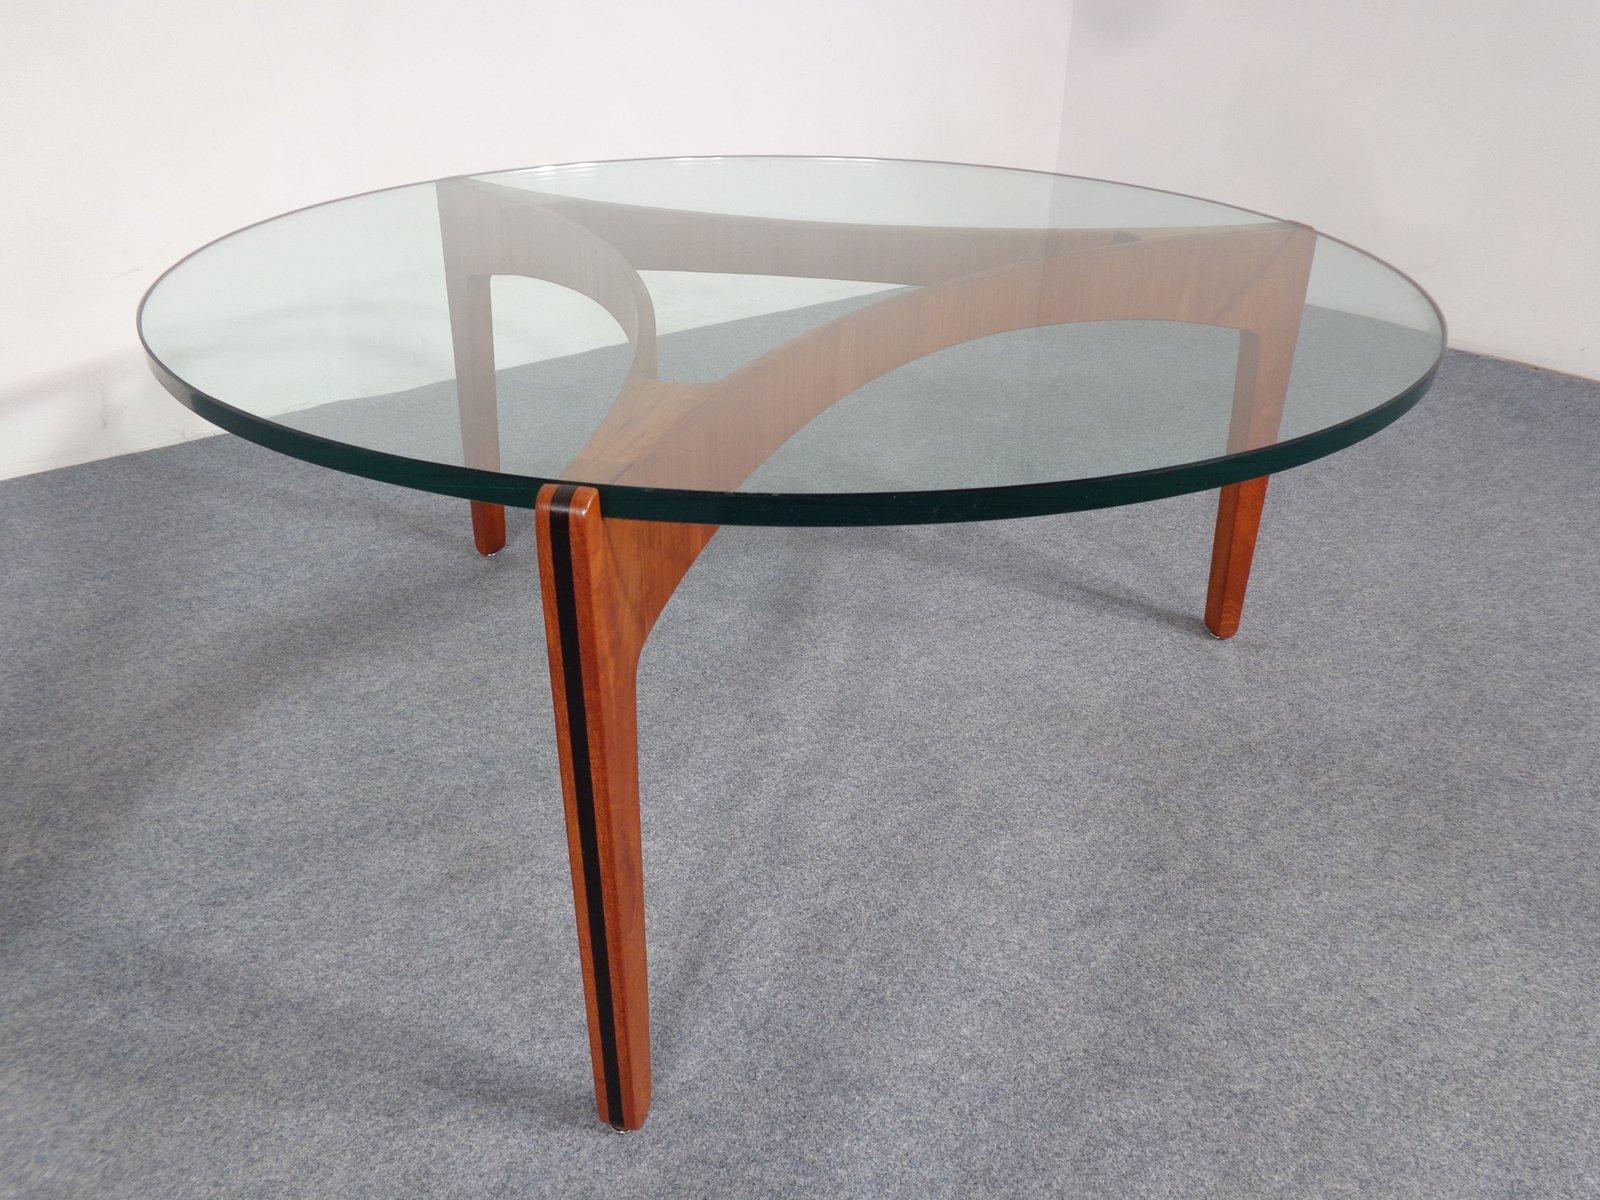 Table basse en teck et verre par sven ellekaer pour - Table basse teck et verre ...